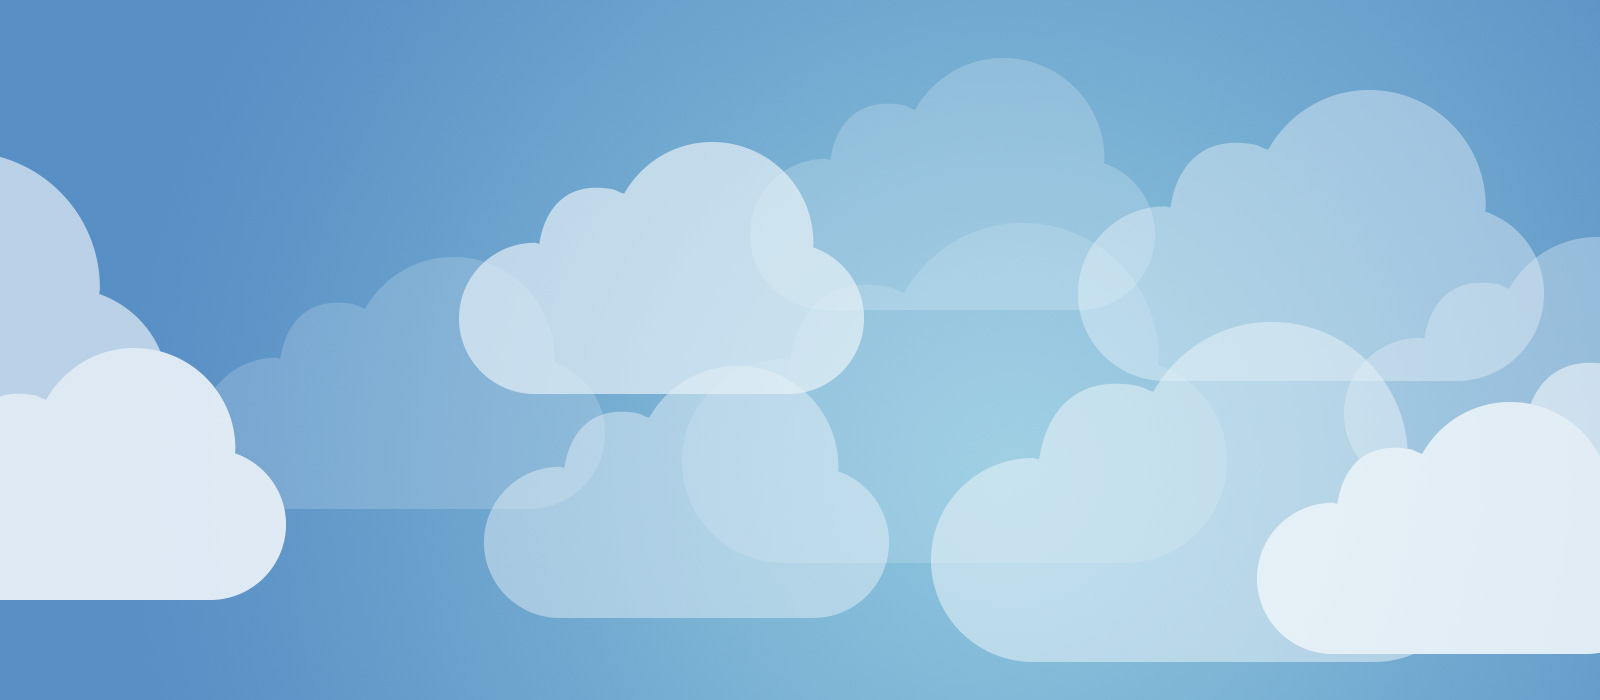 Trade Mark Cloud